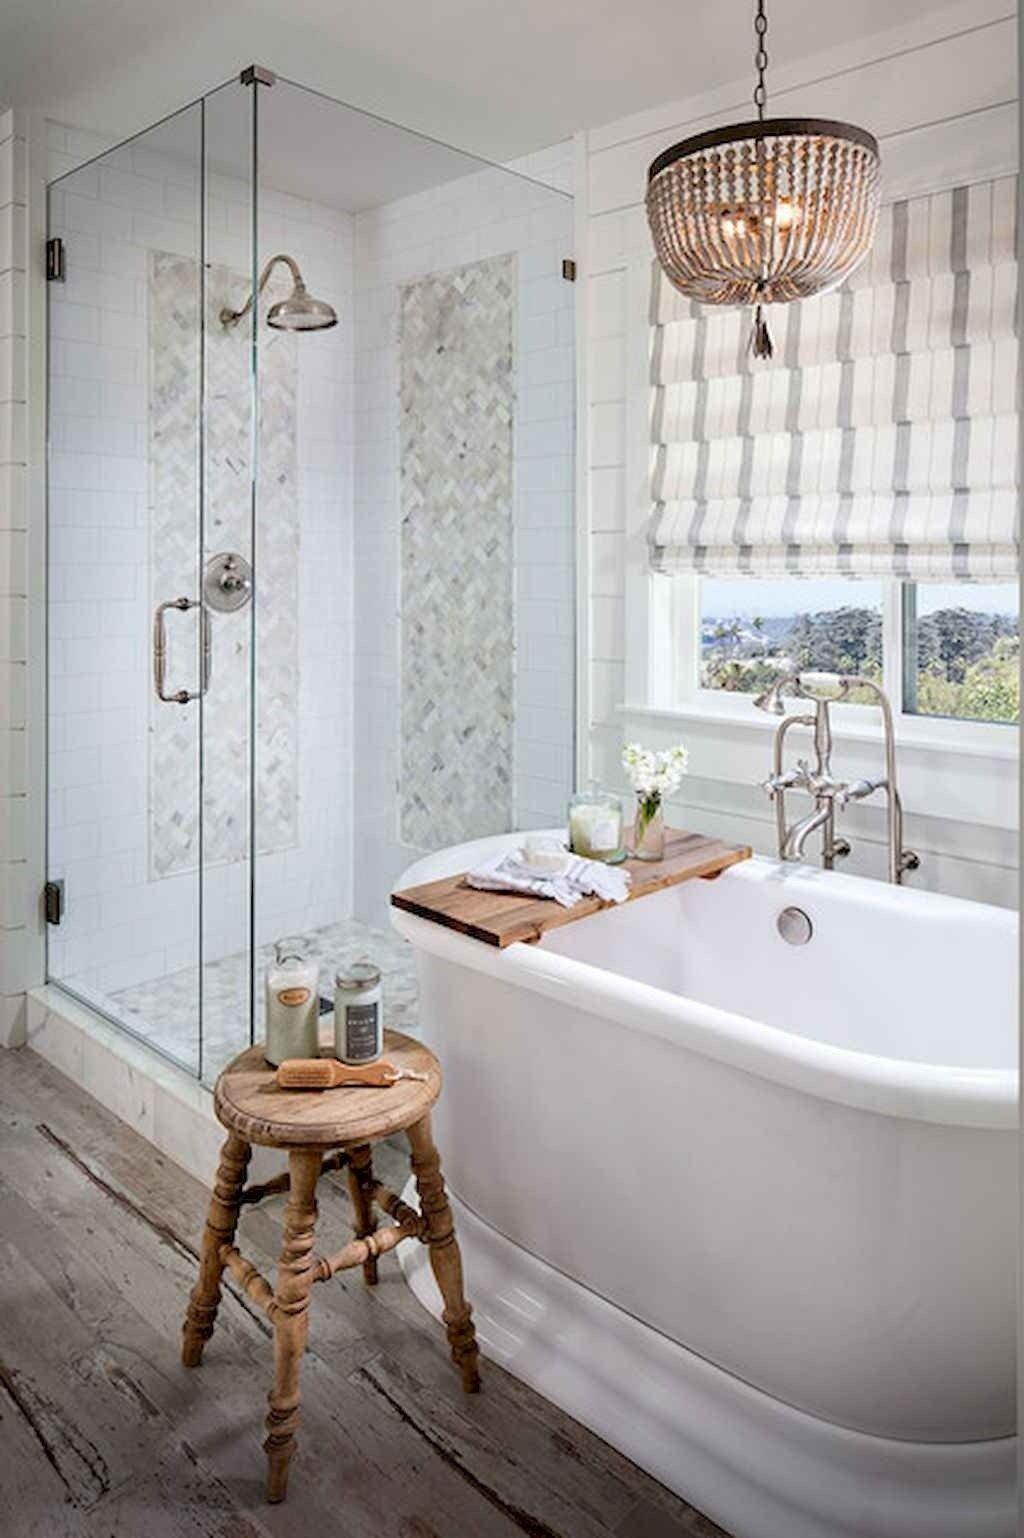 150 Amazing Small Farmhouse Bathroom Decor Ideas And ... on Amazing Small Bathrooms  id=32434